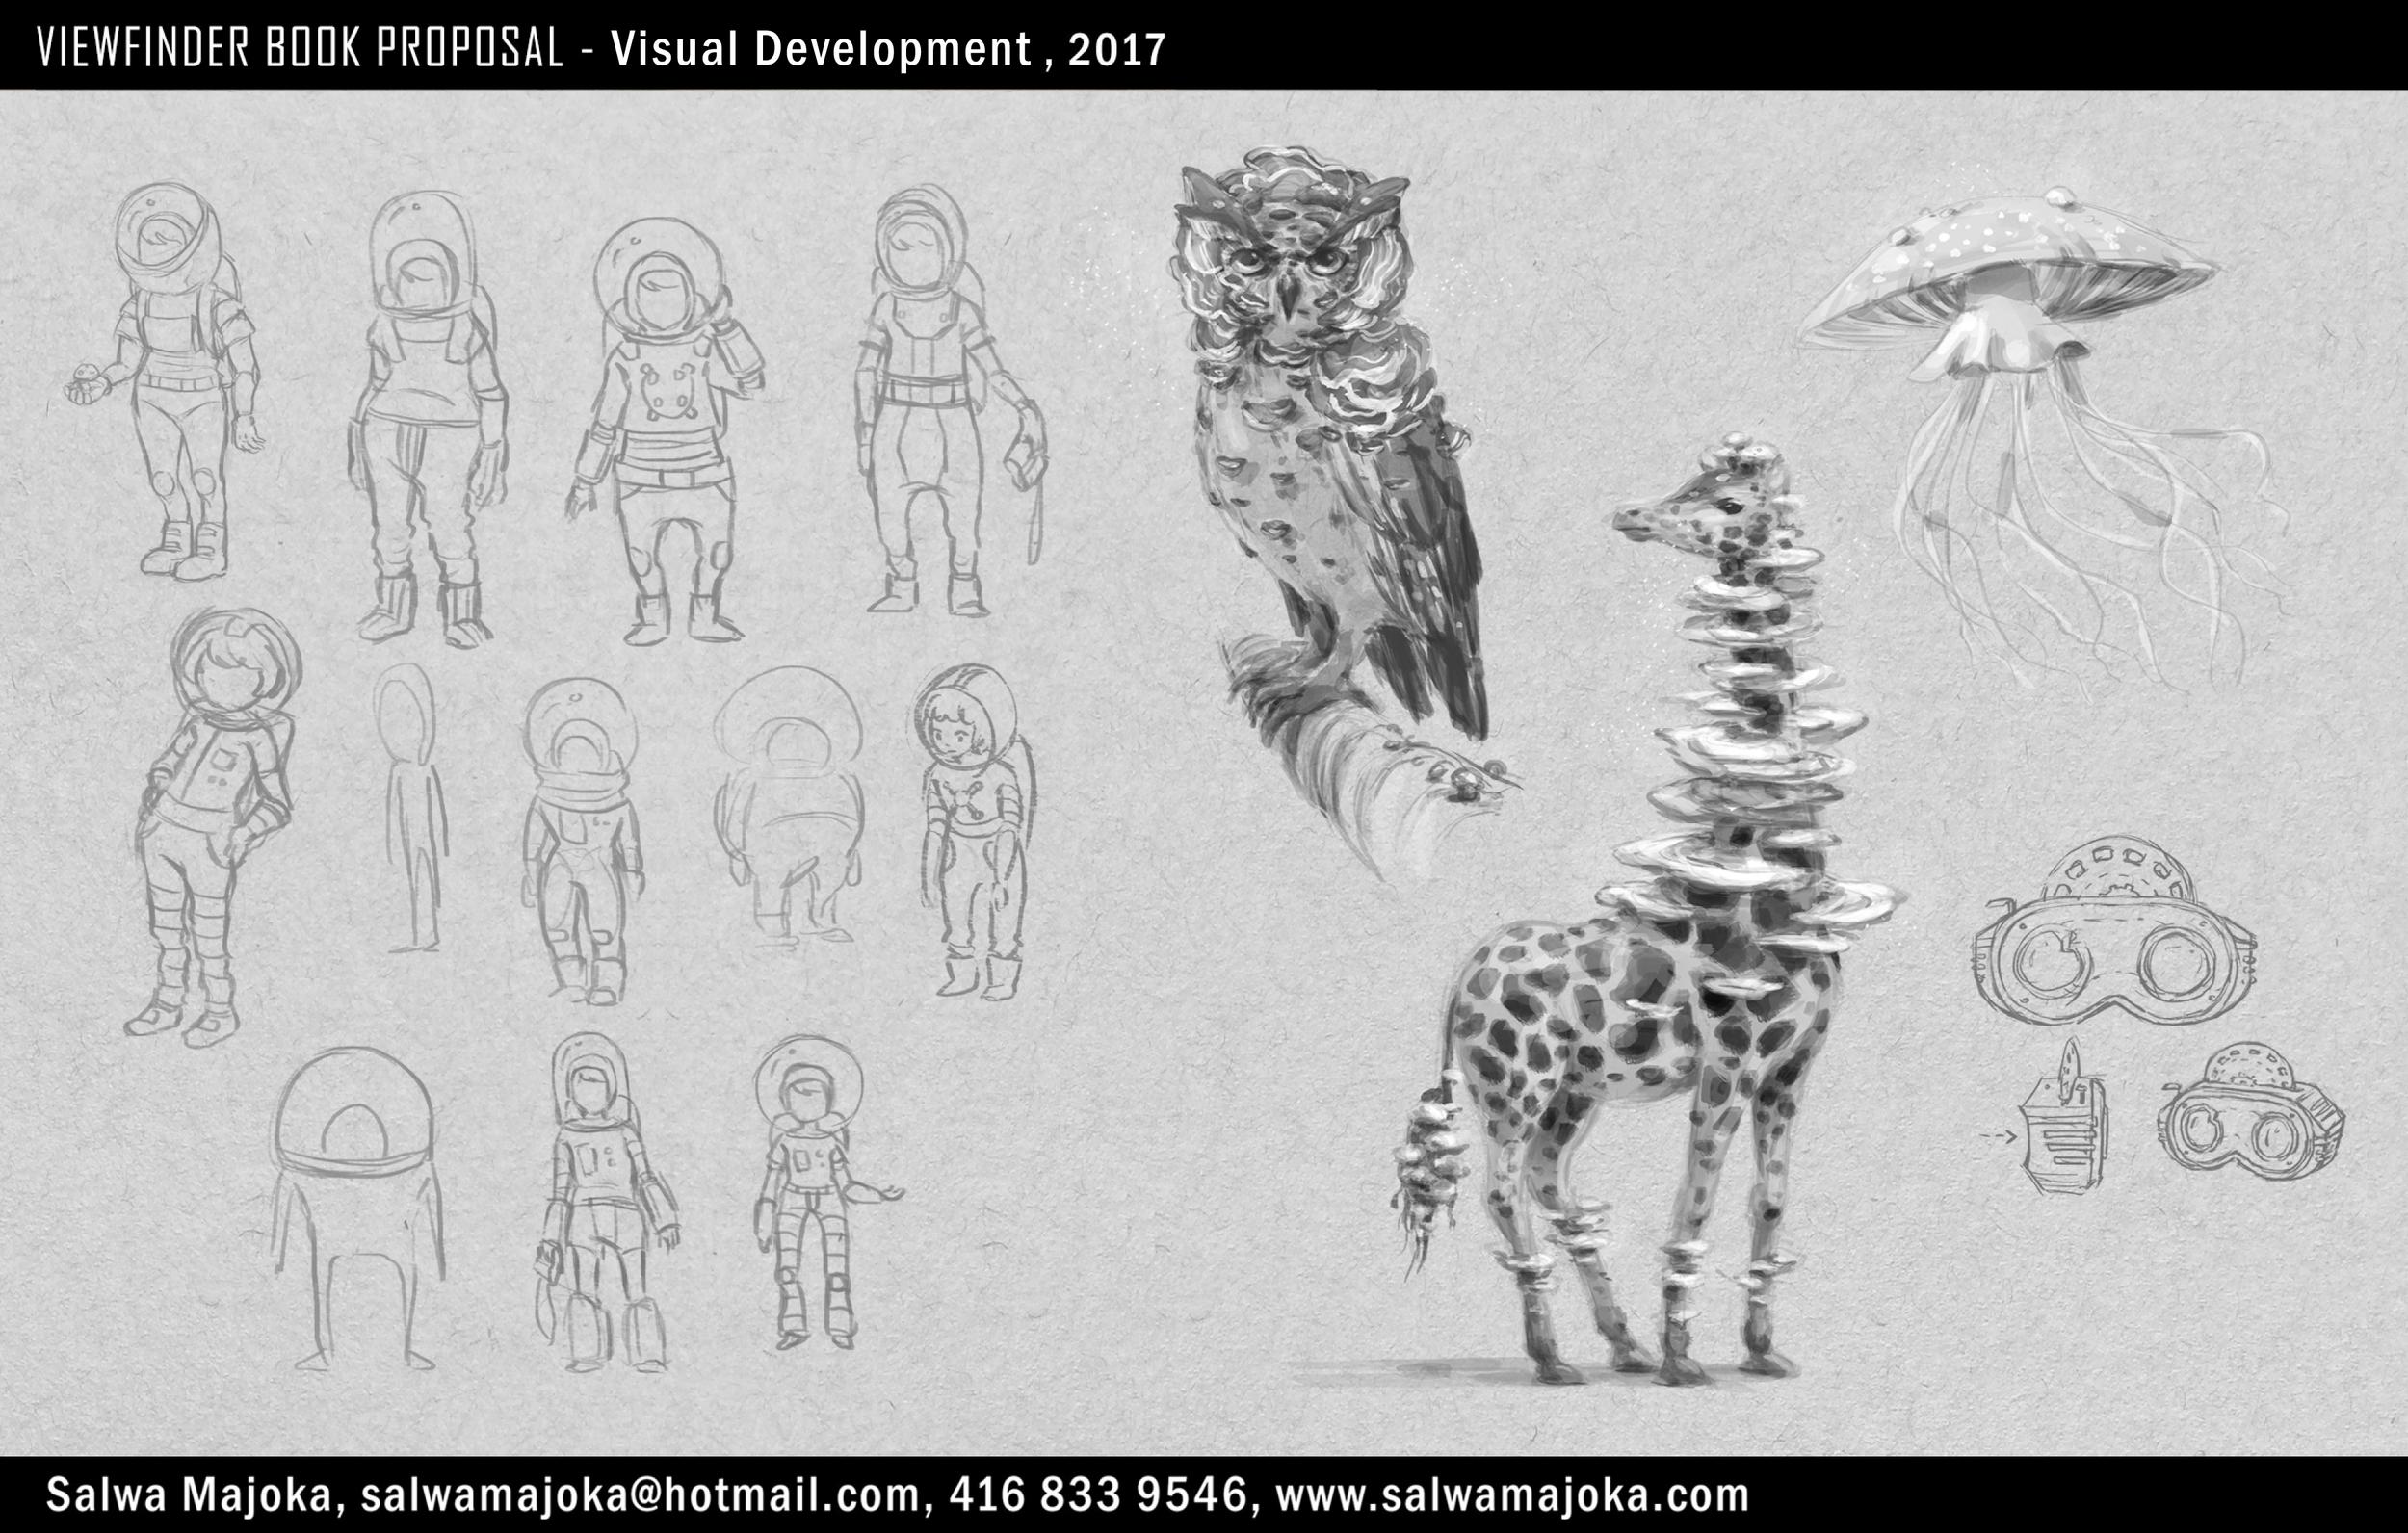 VisualDevelopmentPortfolio-14edit.png